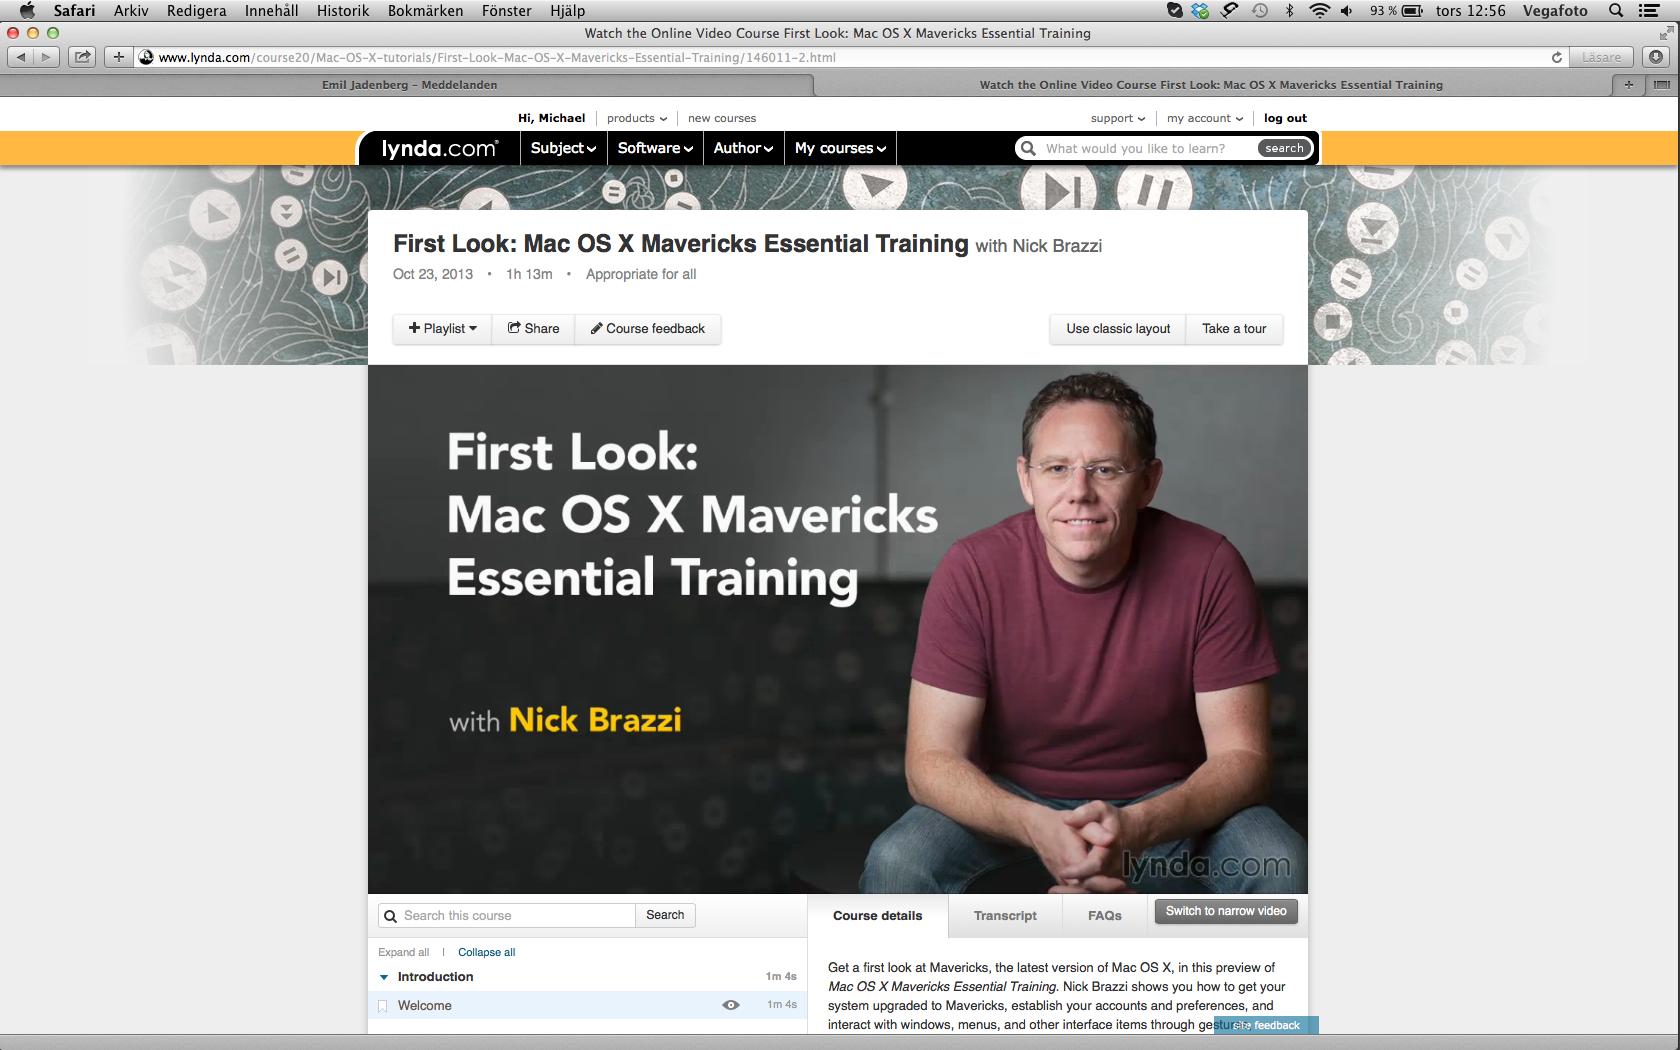 Screenshot 2013-10-31 12.56.08.png